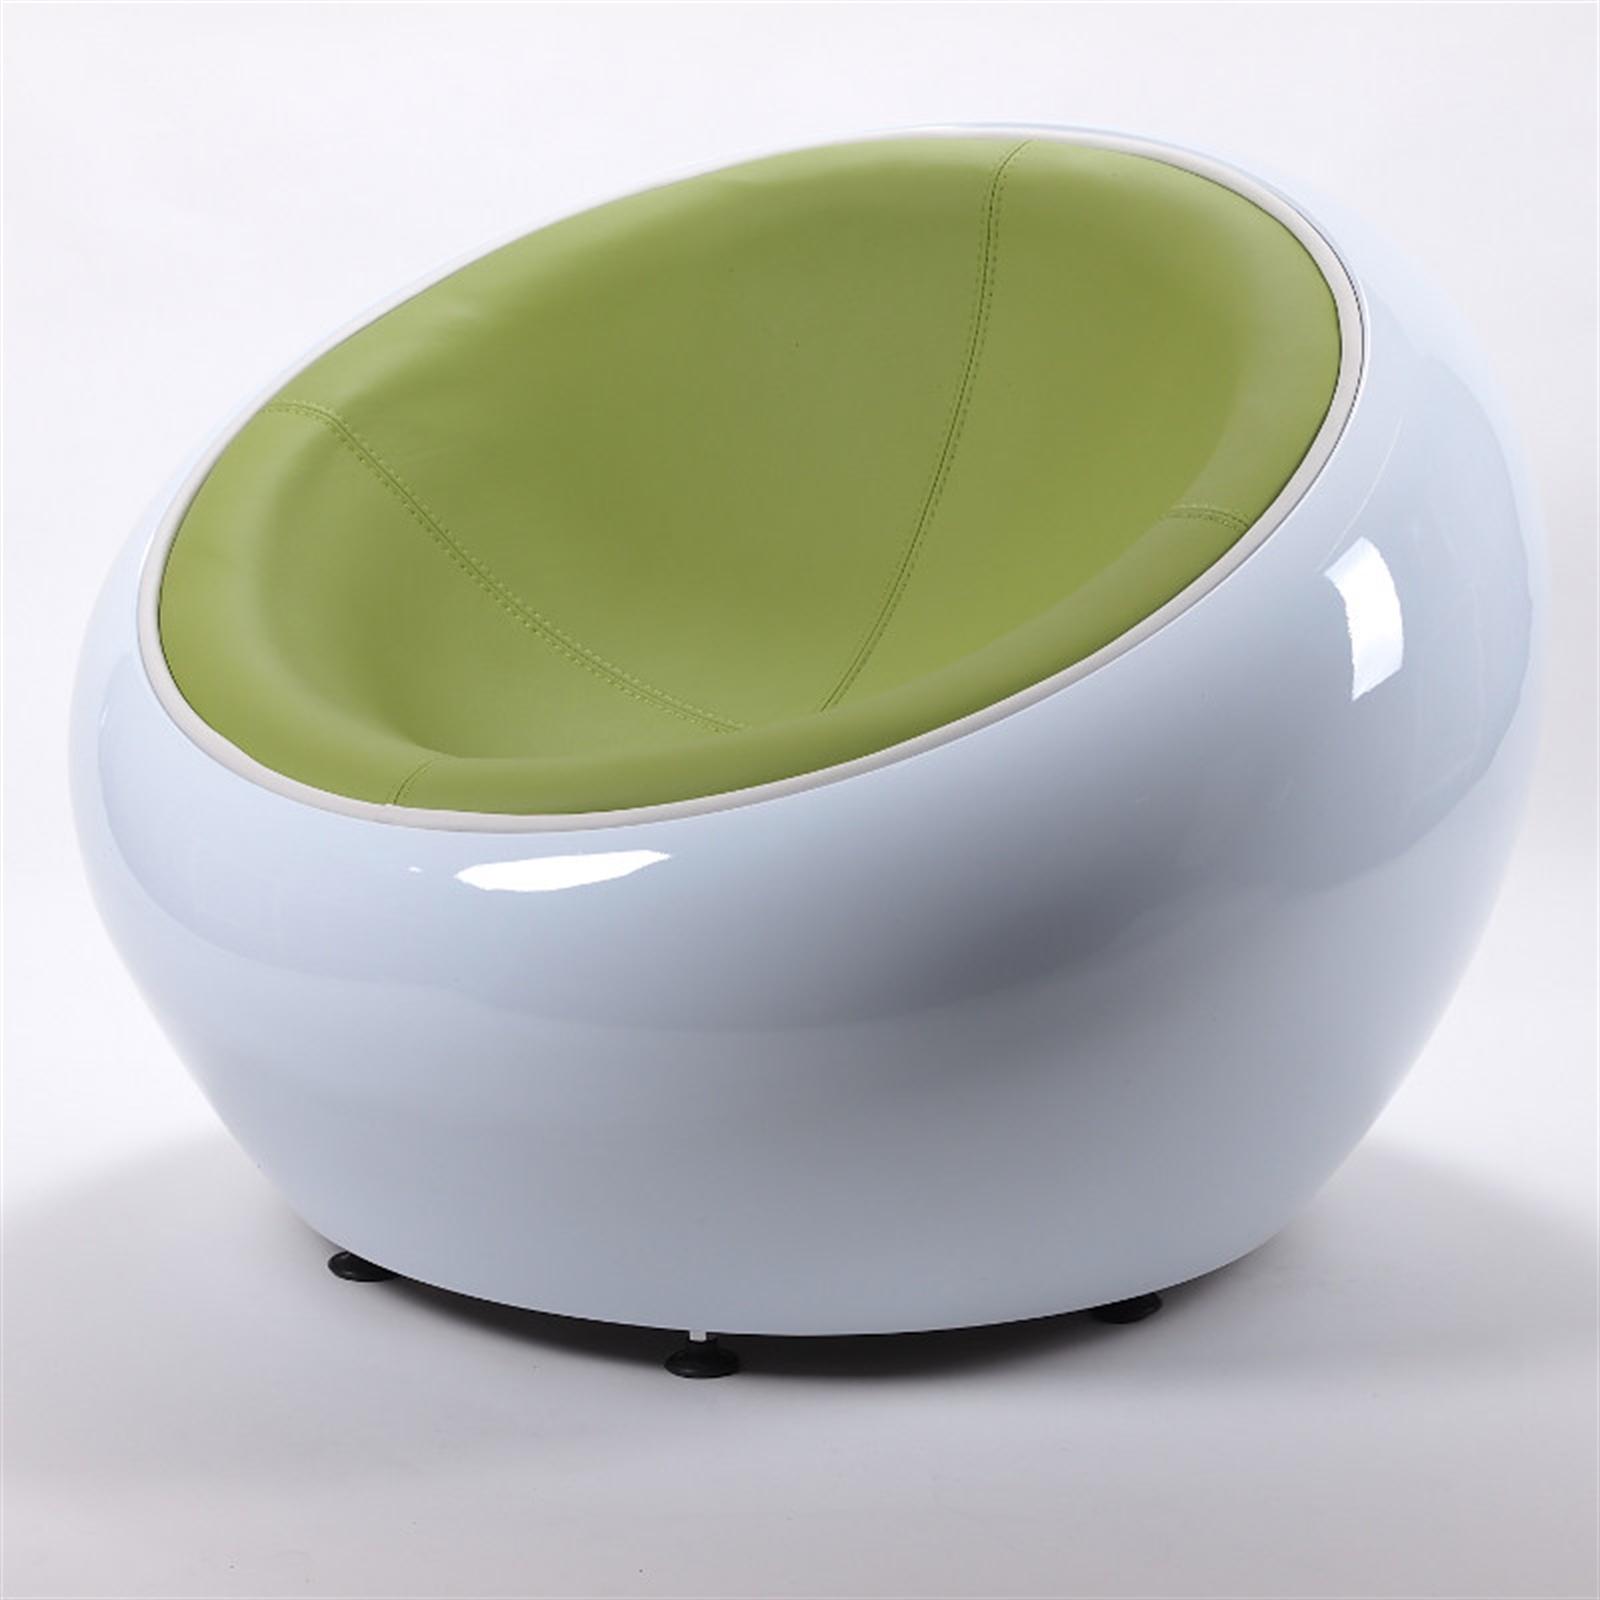 1 of 6 RETRO LOUNGE EGG CHAIR   white-black   bowl lounge design stool shell & RETRO LOUNGE EGG CHAIR   white-black   bowl lounge design stool ...